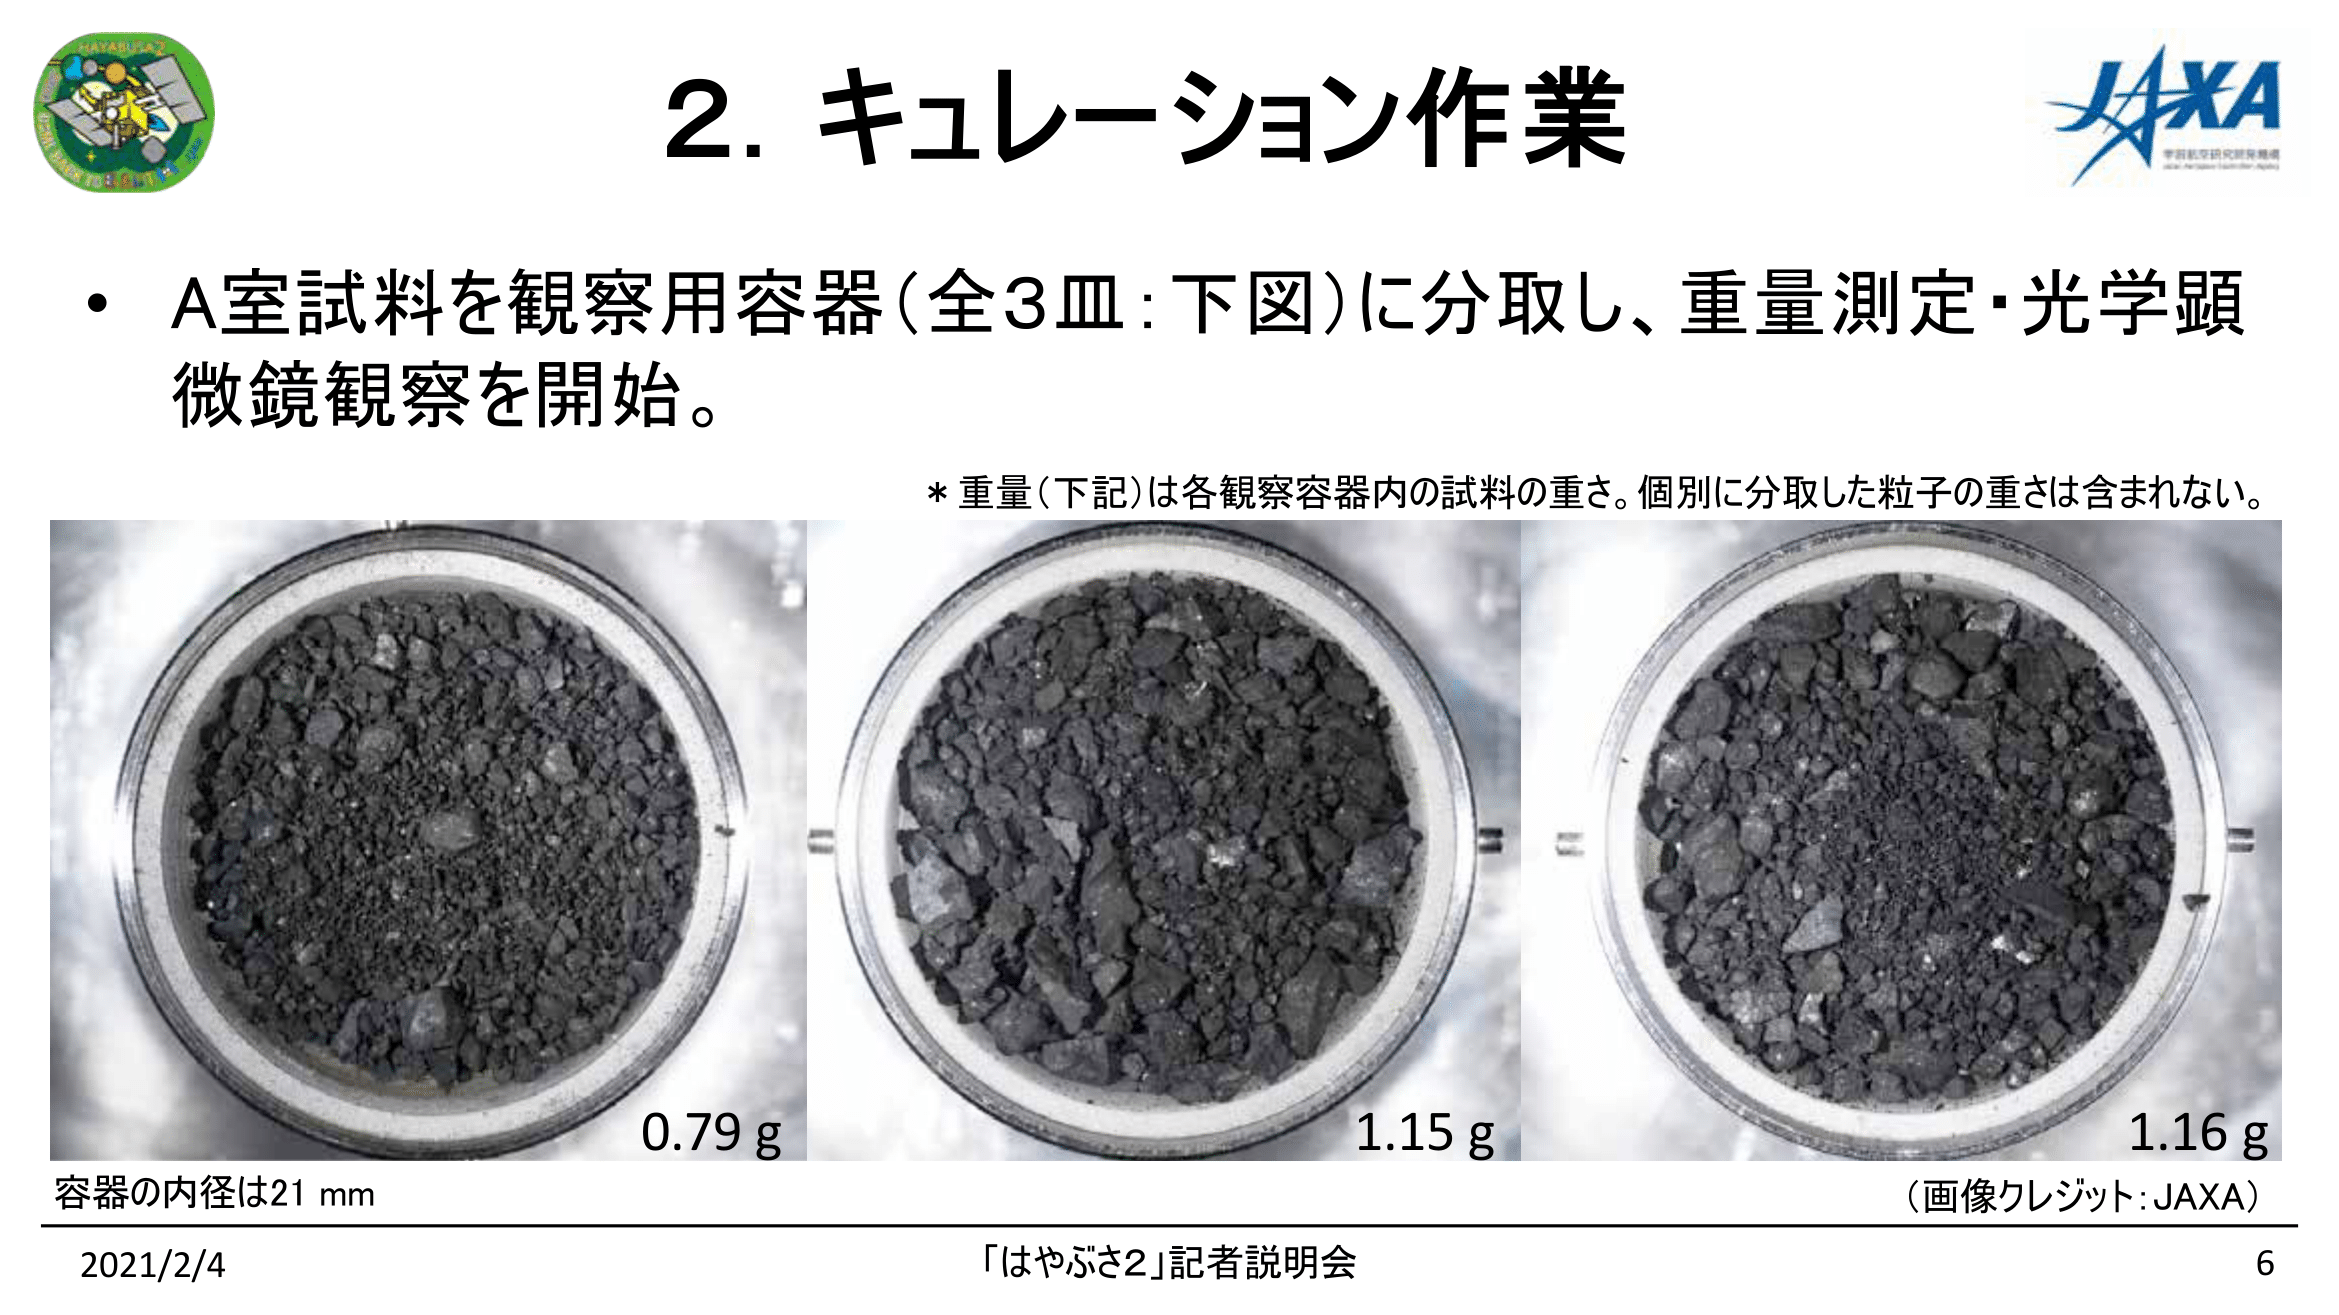 f:id:Imamura:20210204134210p:plain